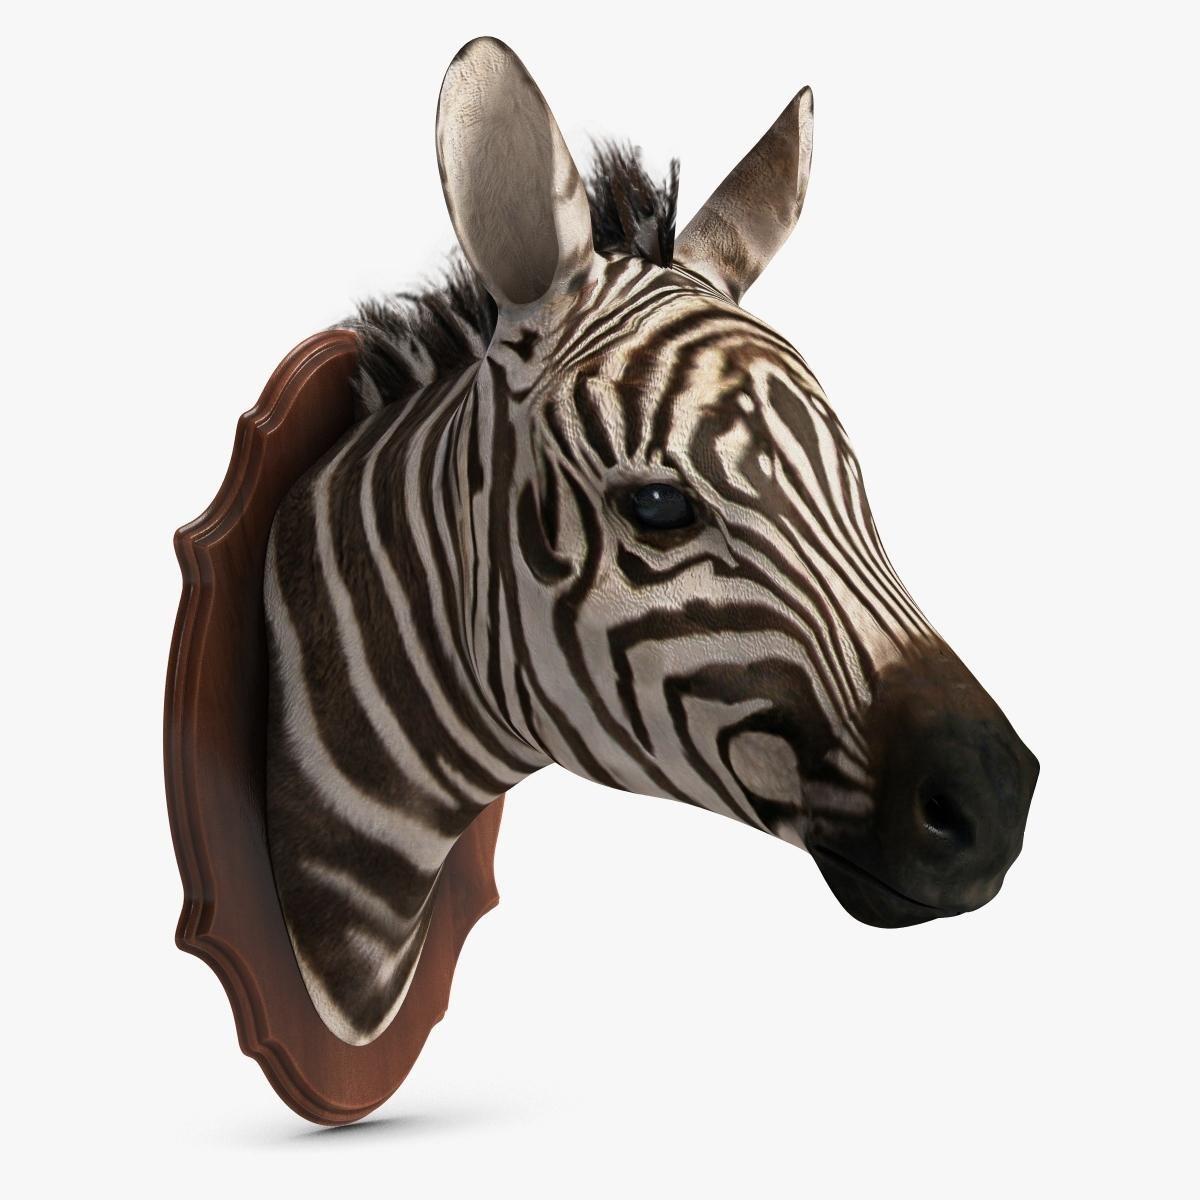 3d Model Of Zebra Hd 3d Model Zebra Model